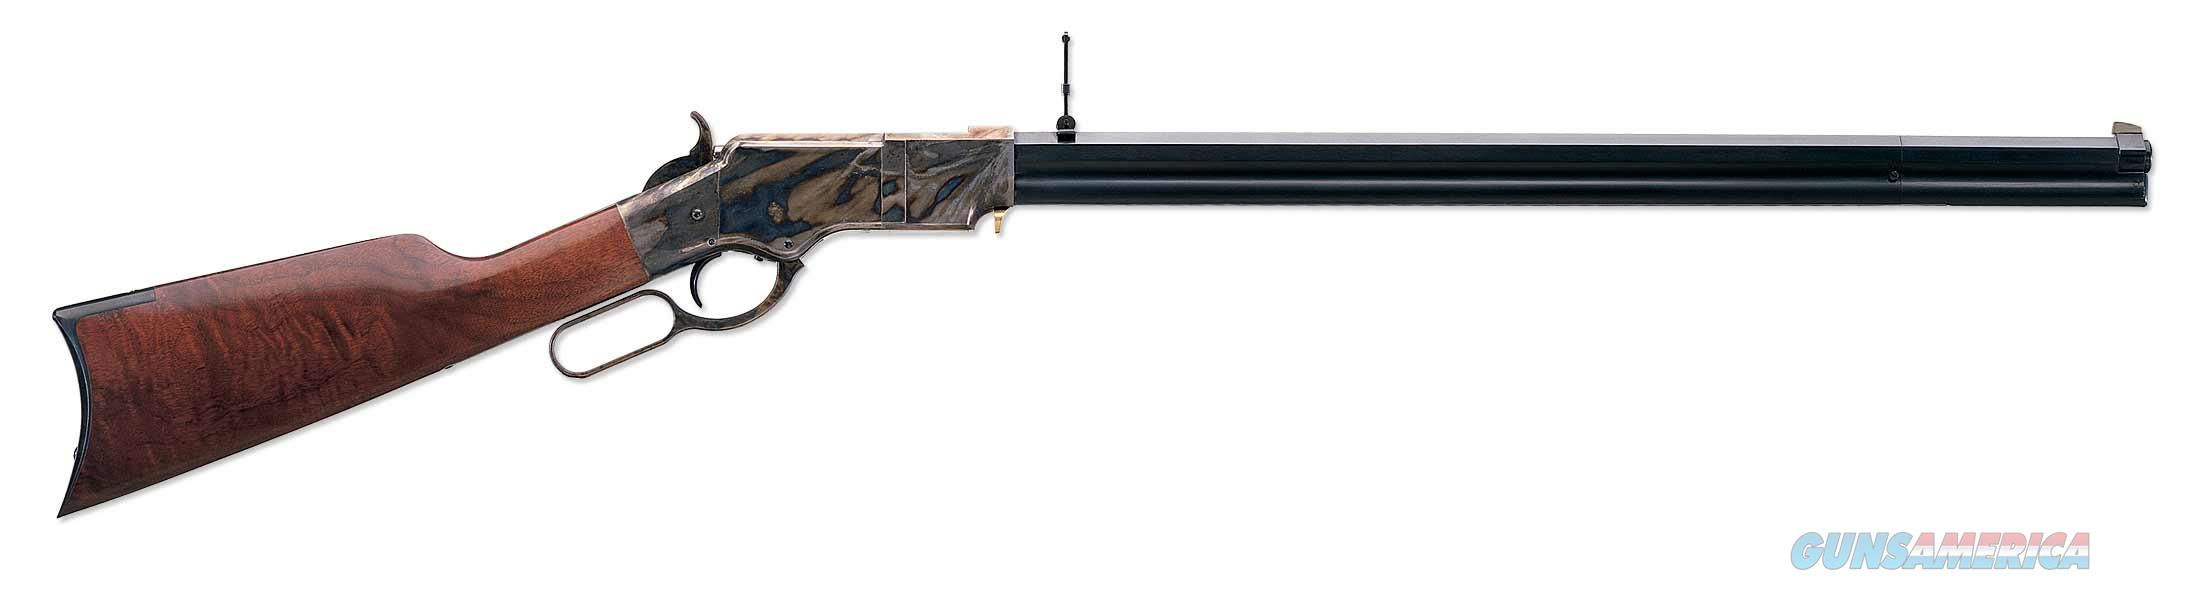 "Uberti 1860 Henry Steel Rifle .45 Colt 24.5"" Octagon 342360  Guns > Rifles > Uberti Rifles > Lever Action"